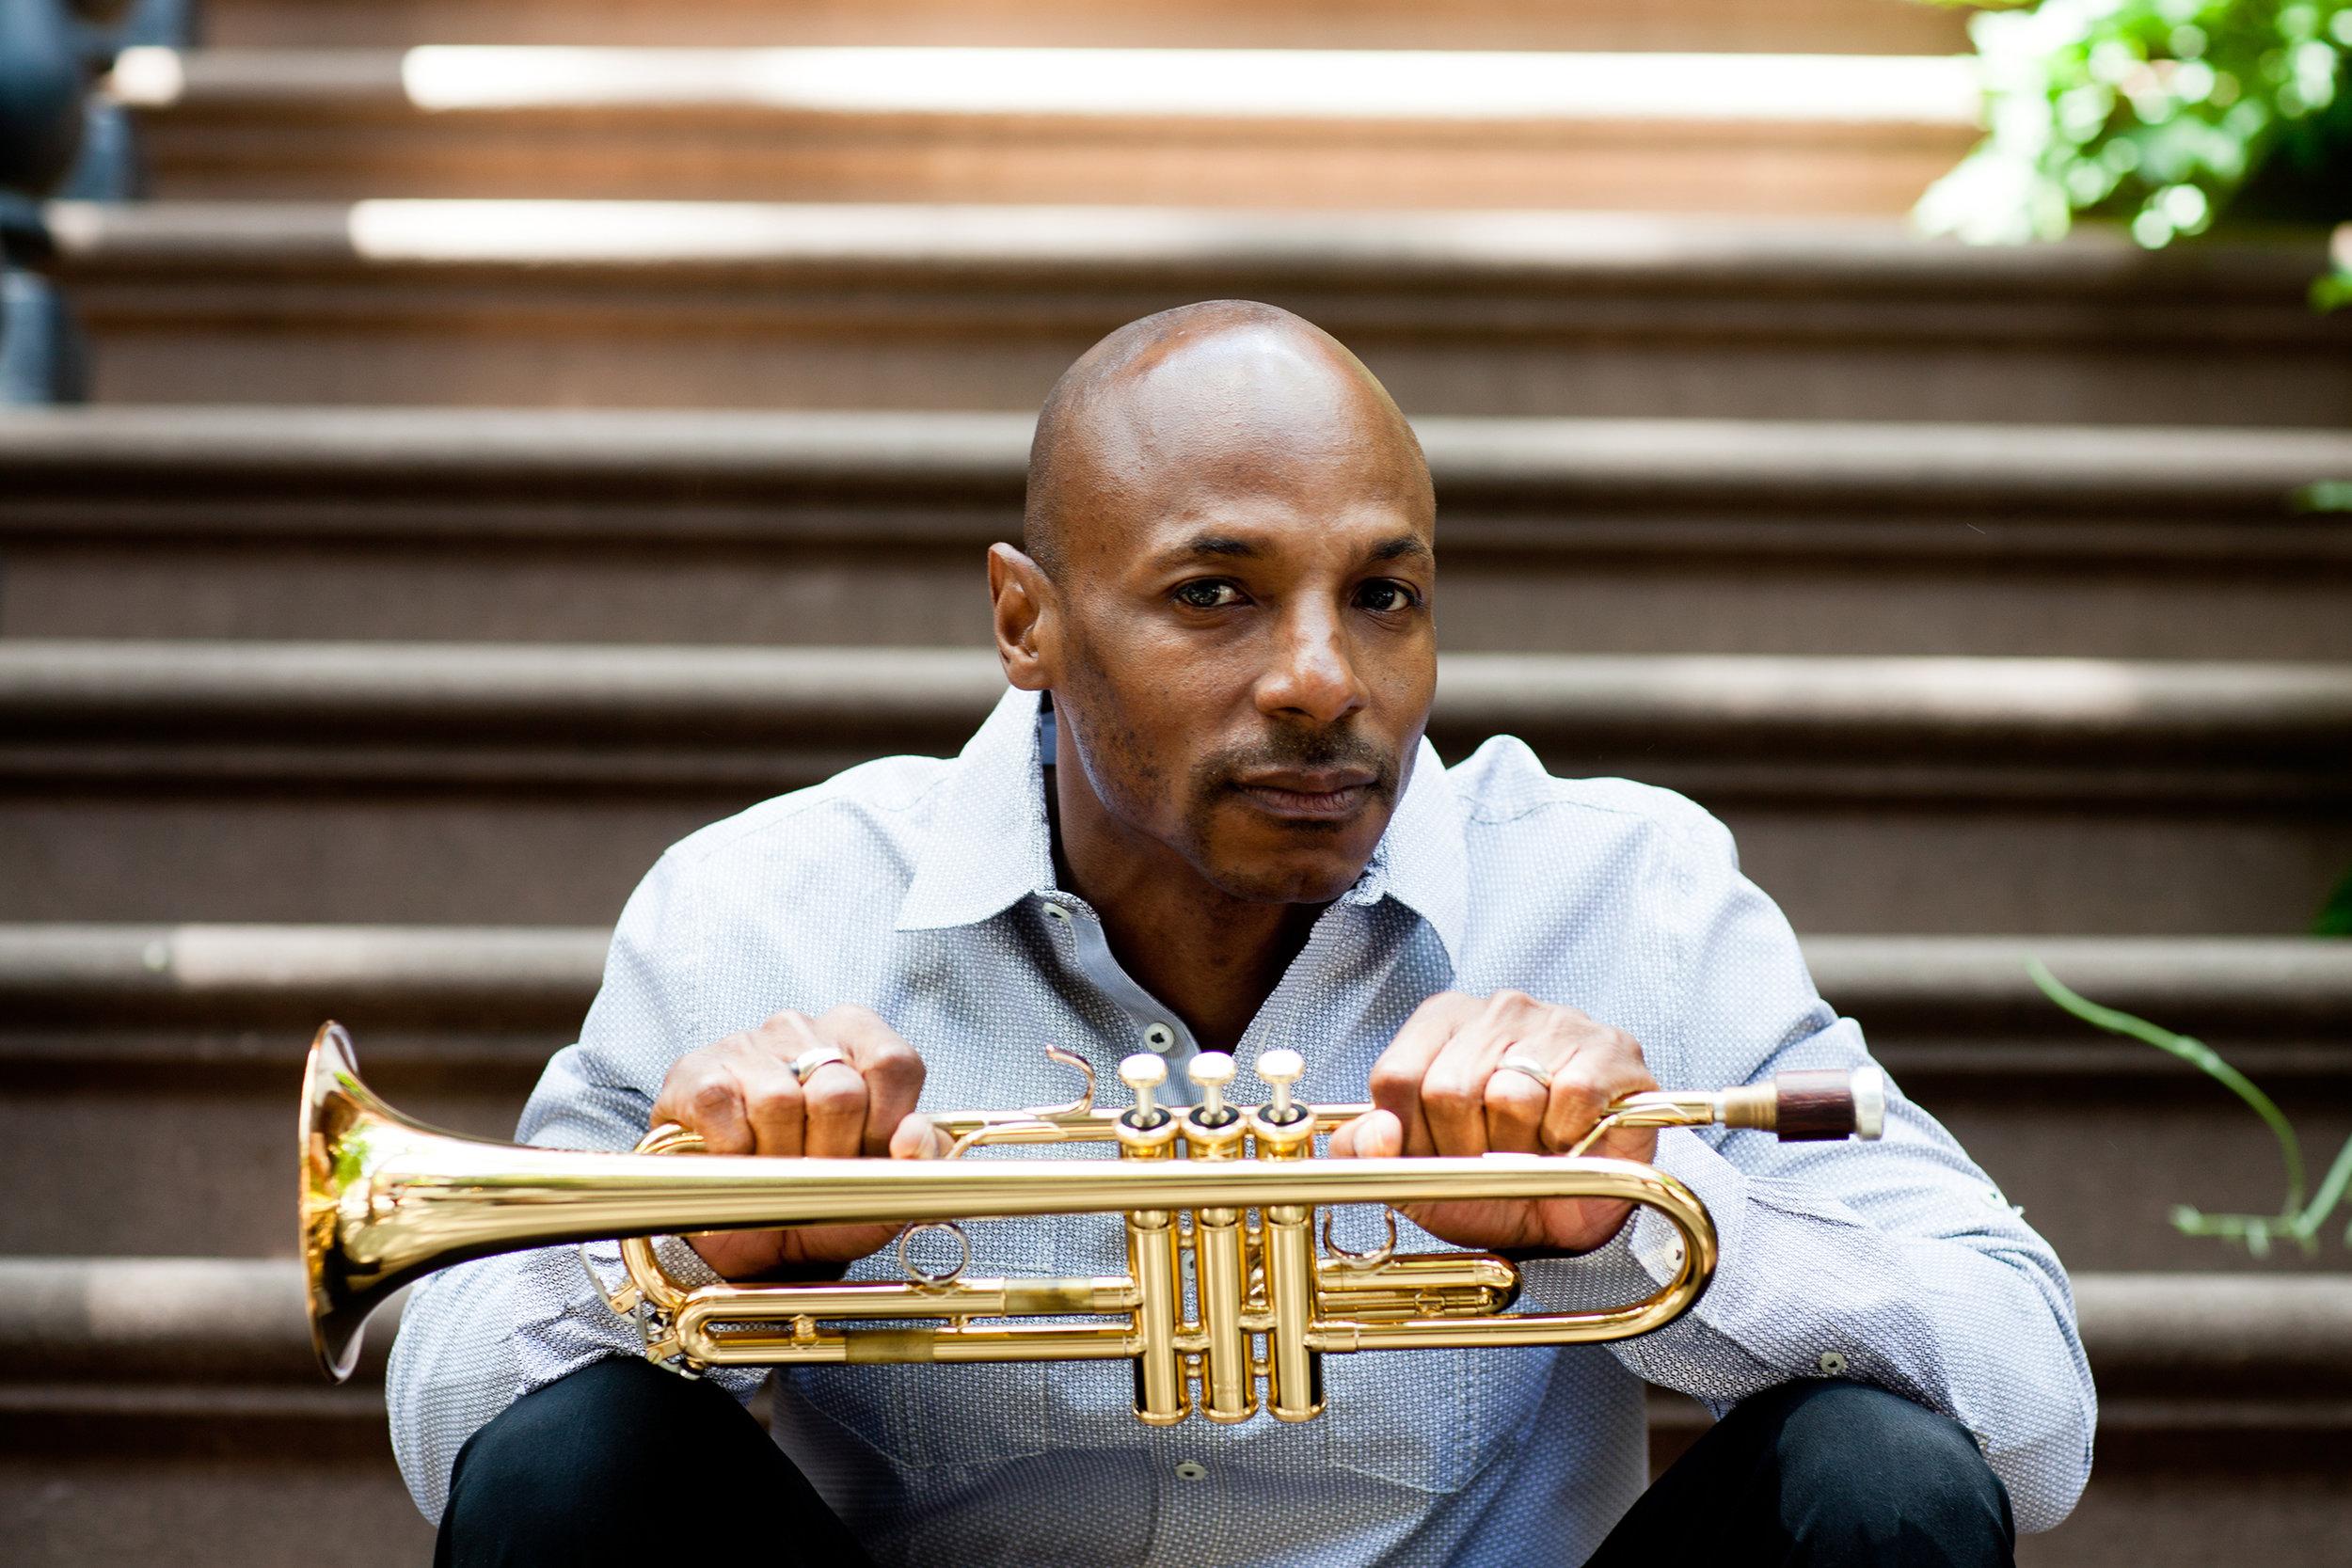 duane-eubanks-trumpet.jpg